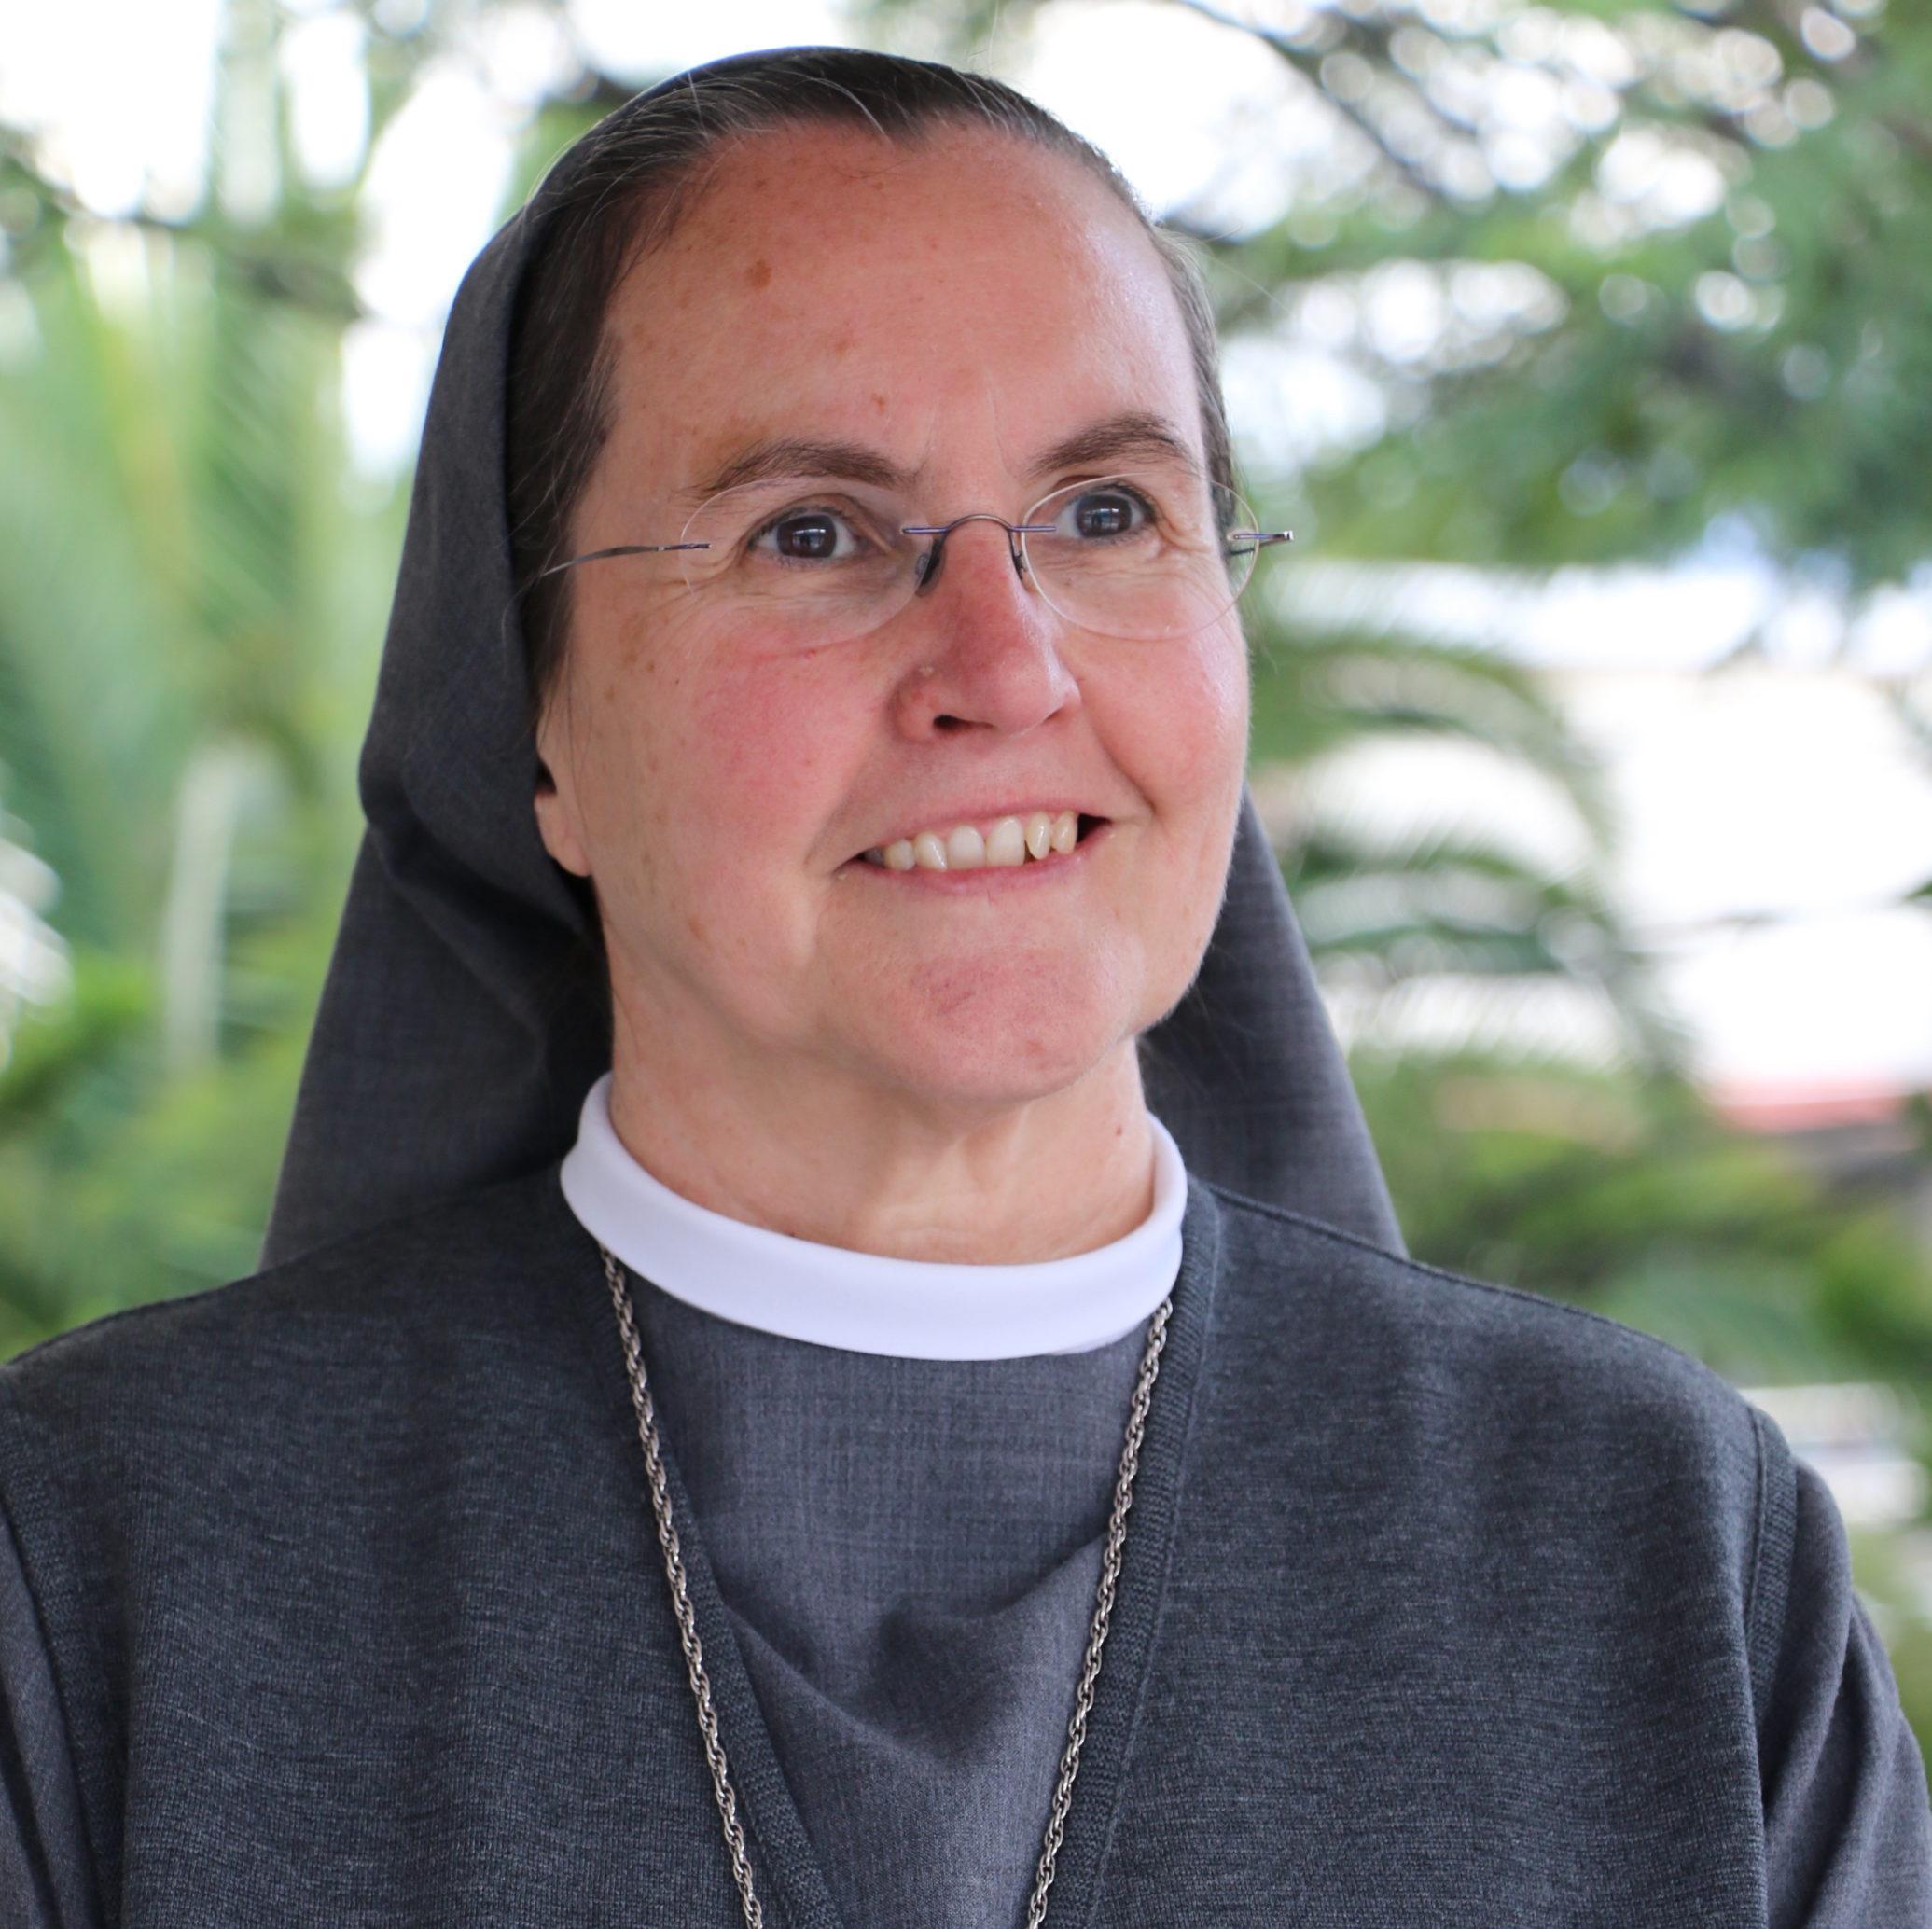 M.Montserrat del Pozo